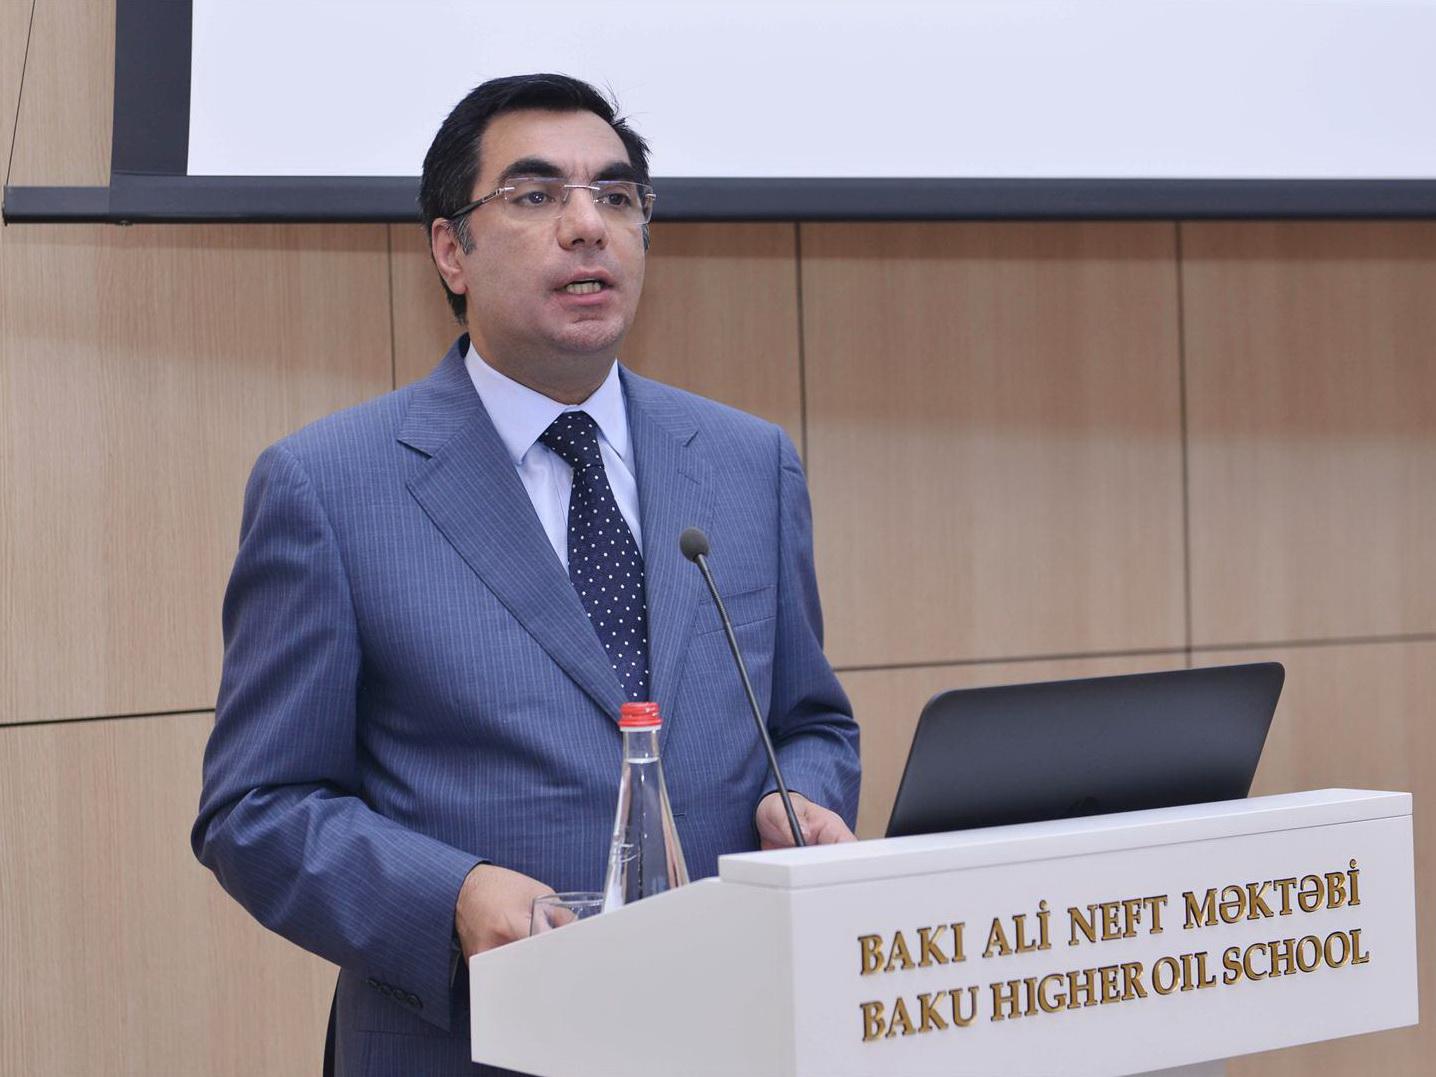 В БВШН представили новую концепцию по профилактике травматизма на производстве – ФОТО